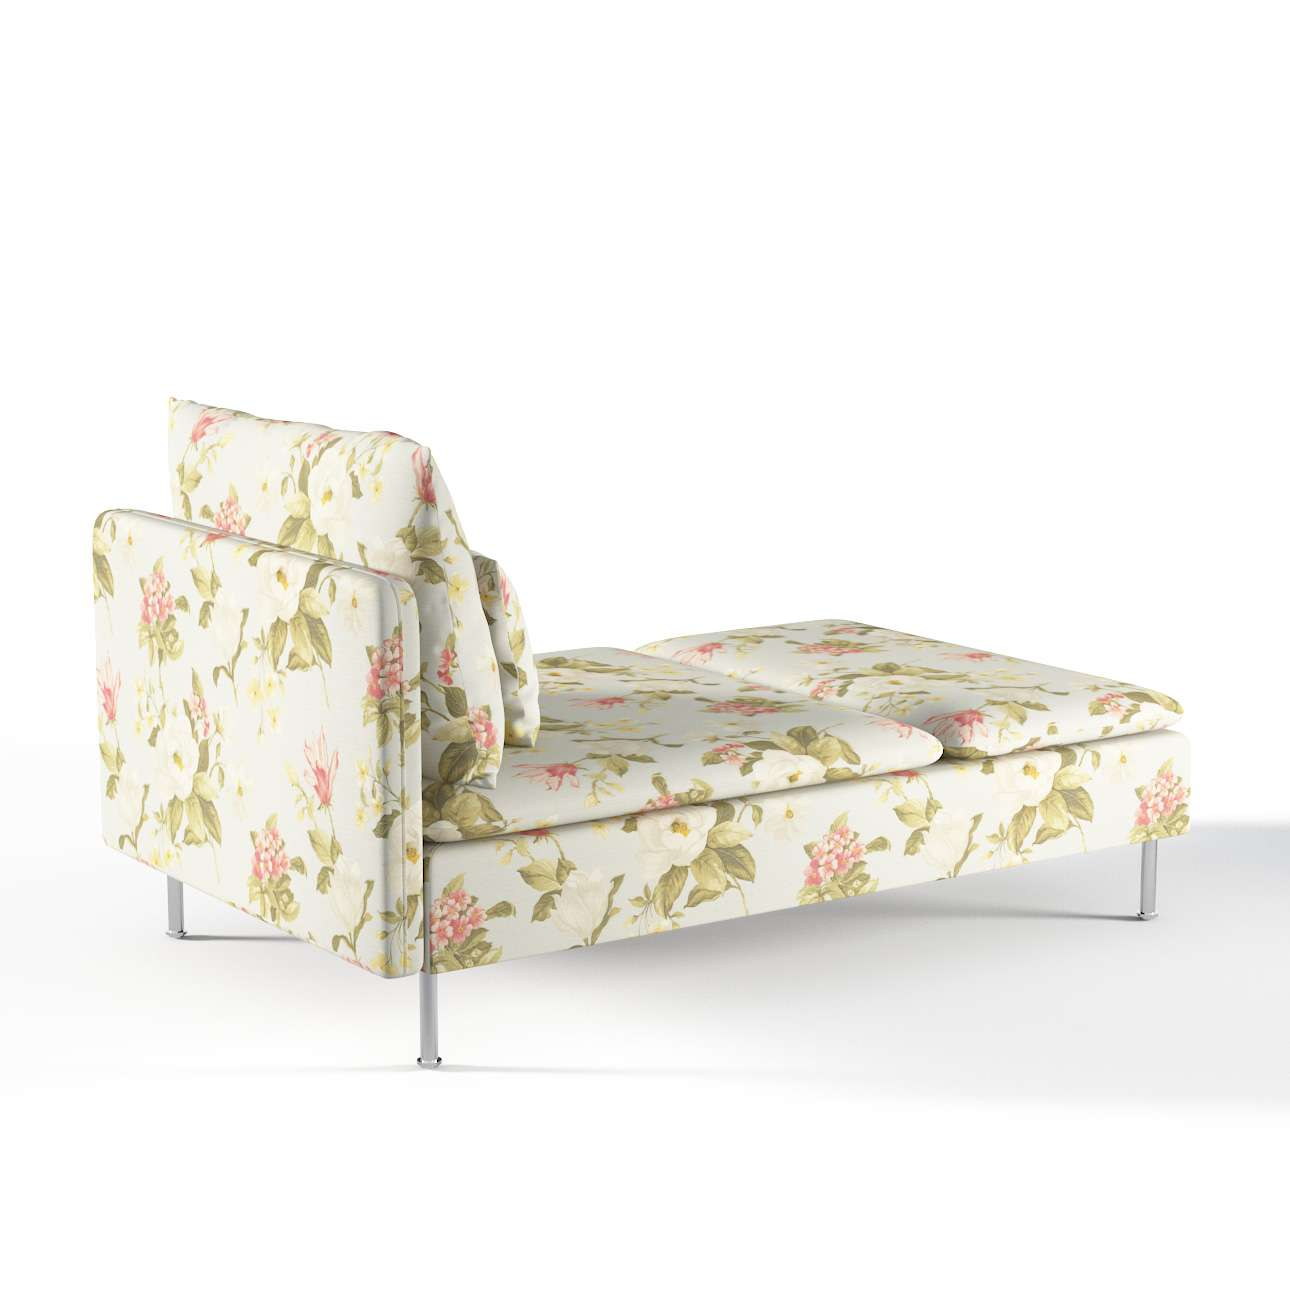 s derhamn bezug f r recamiere helllblau recamiere s derhamn dekoria. Black Bedroom Furniture Sets. Home Design Ideas